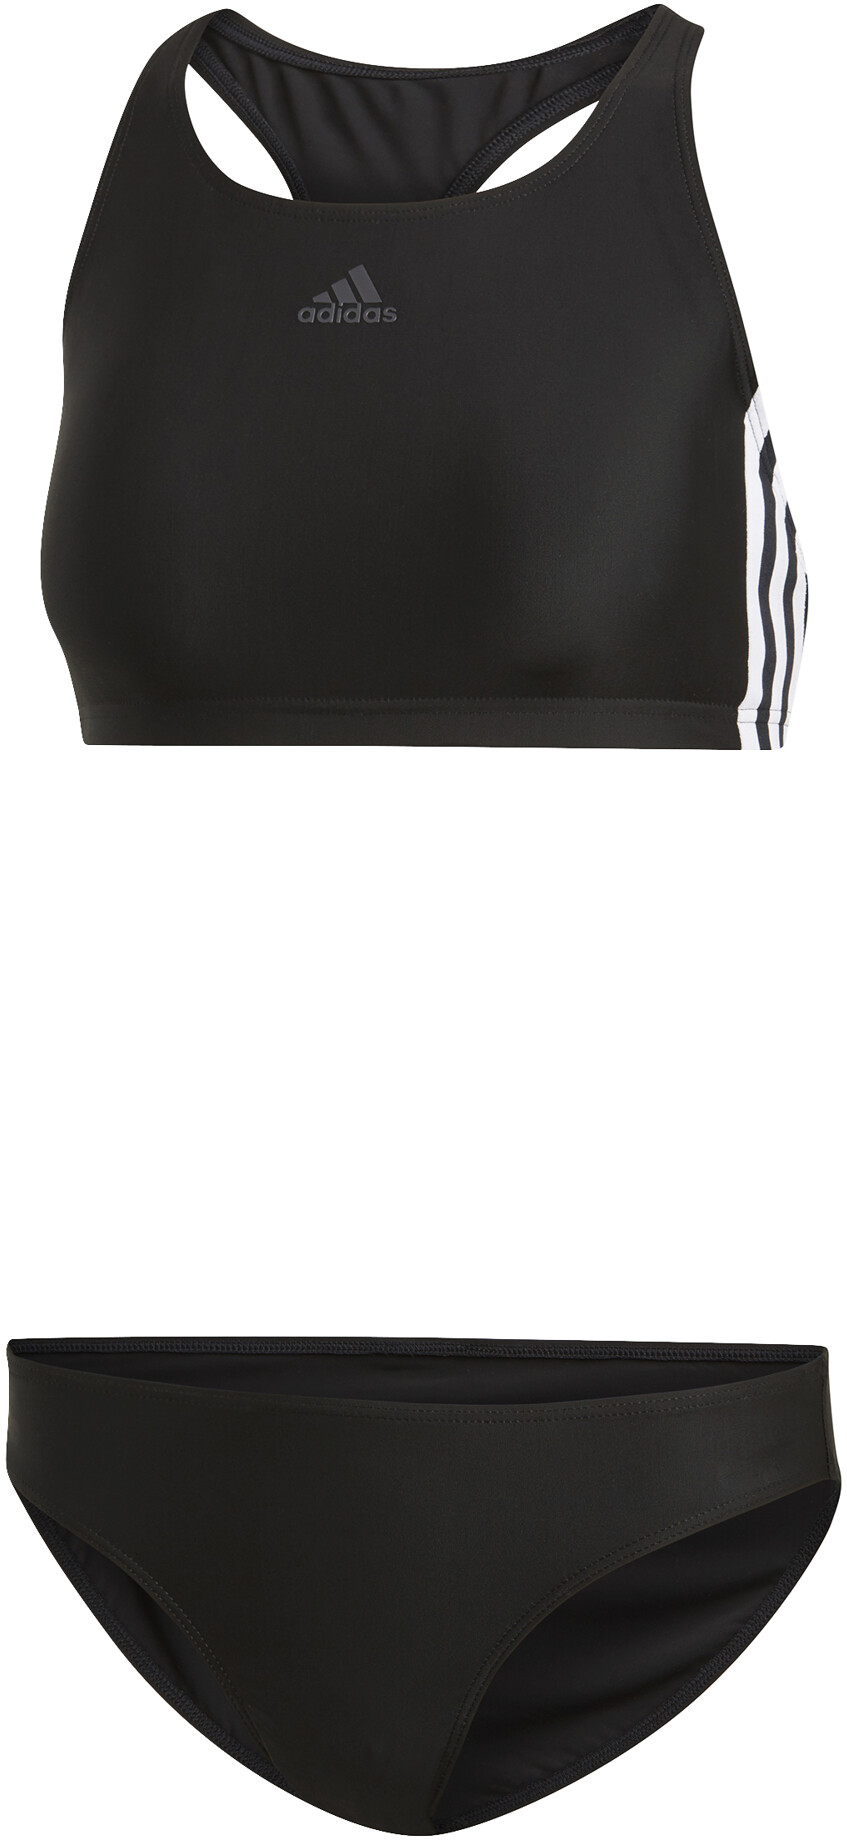 adidas Fit 3-Stripes Bikini Dam svart - till fenomenalt pris på Bikester 5adeef4ba1e68